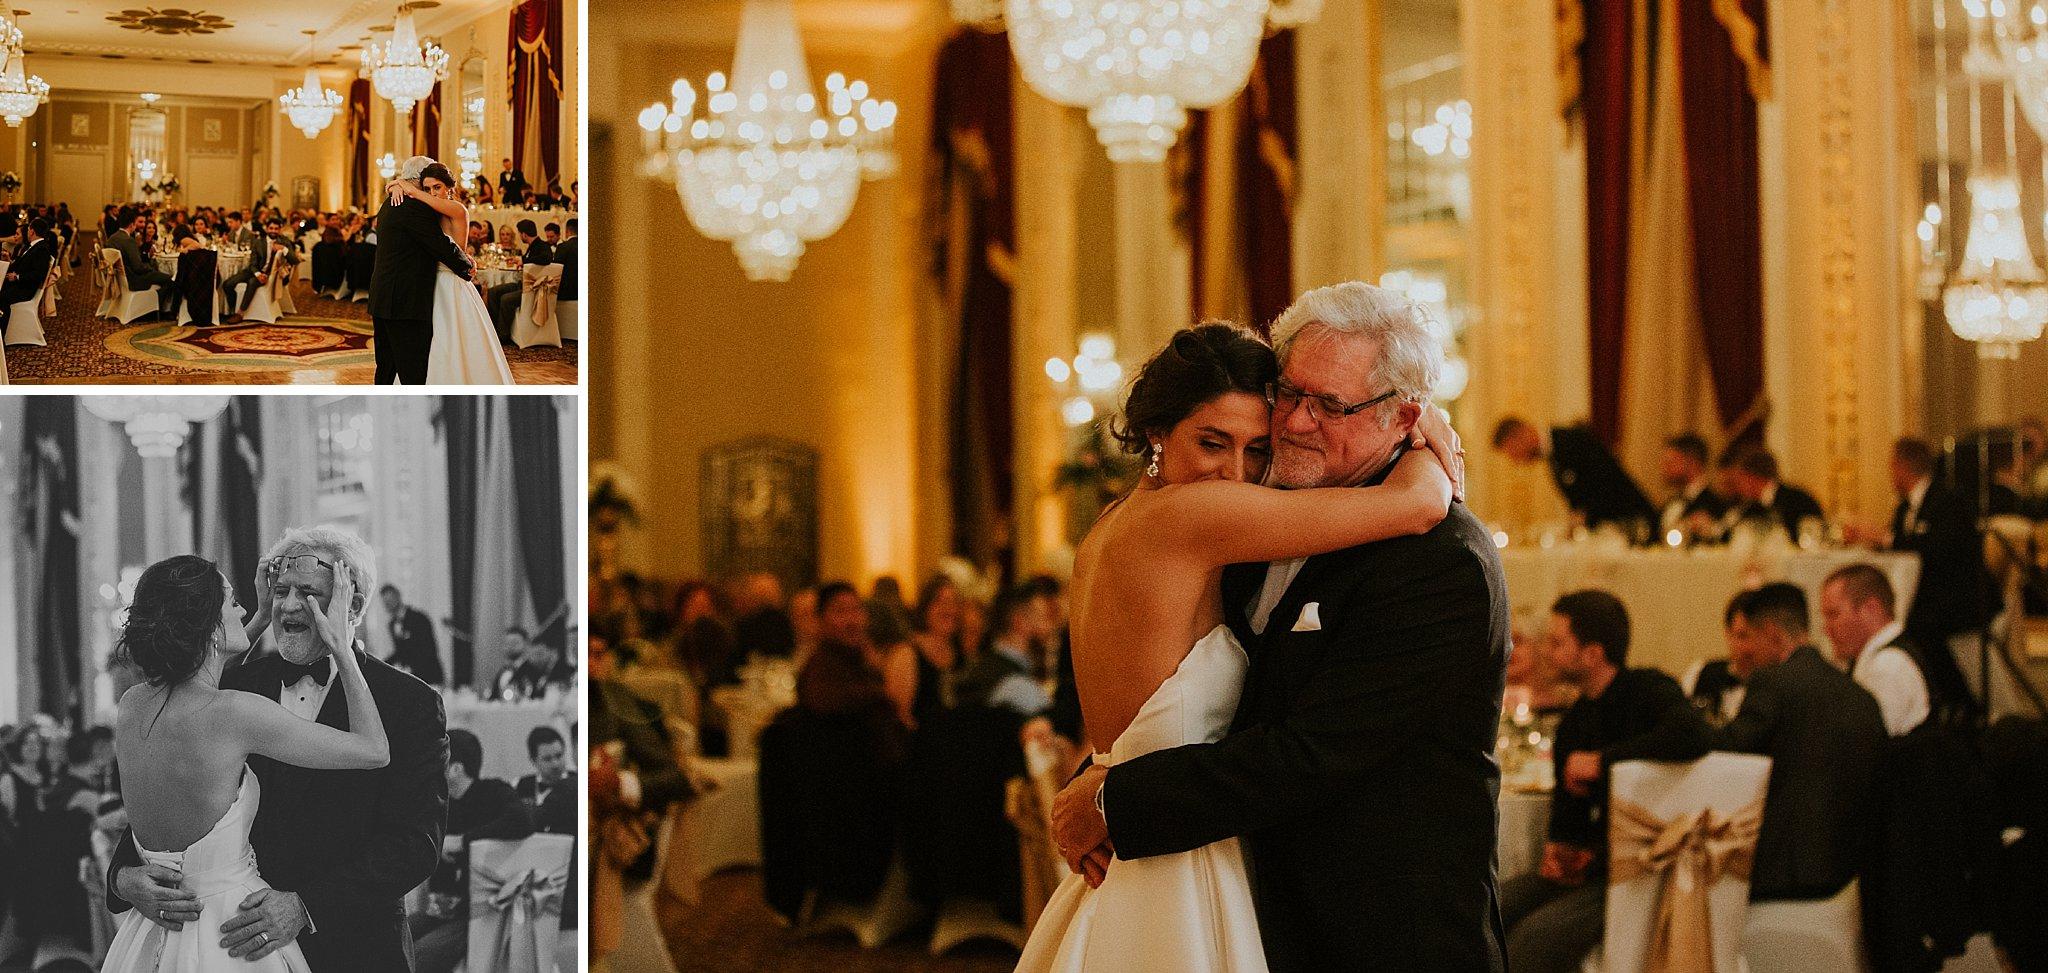 Matt-Lauren_St-Marys_Hilton-City-Center-Milwaukee-Wedding_liller-photo_0071.jpg